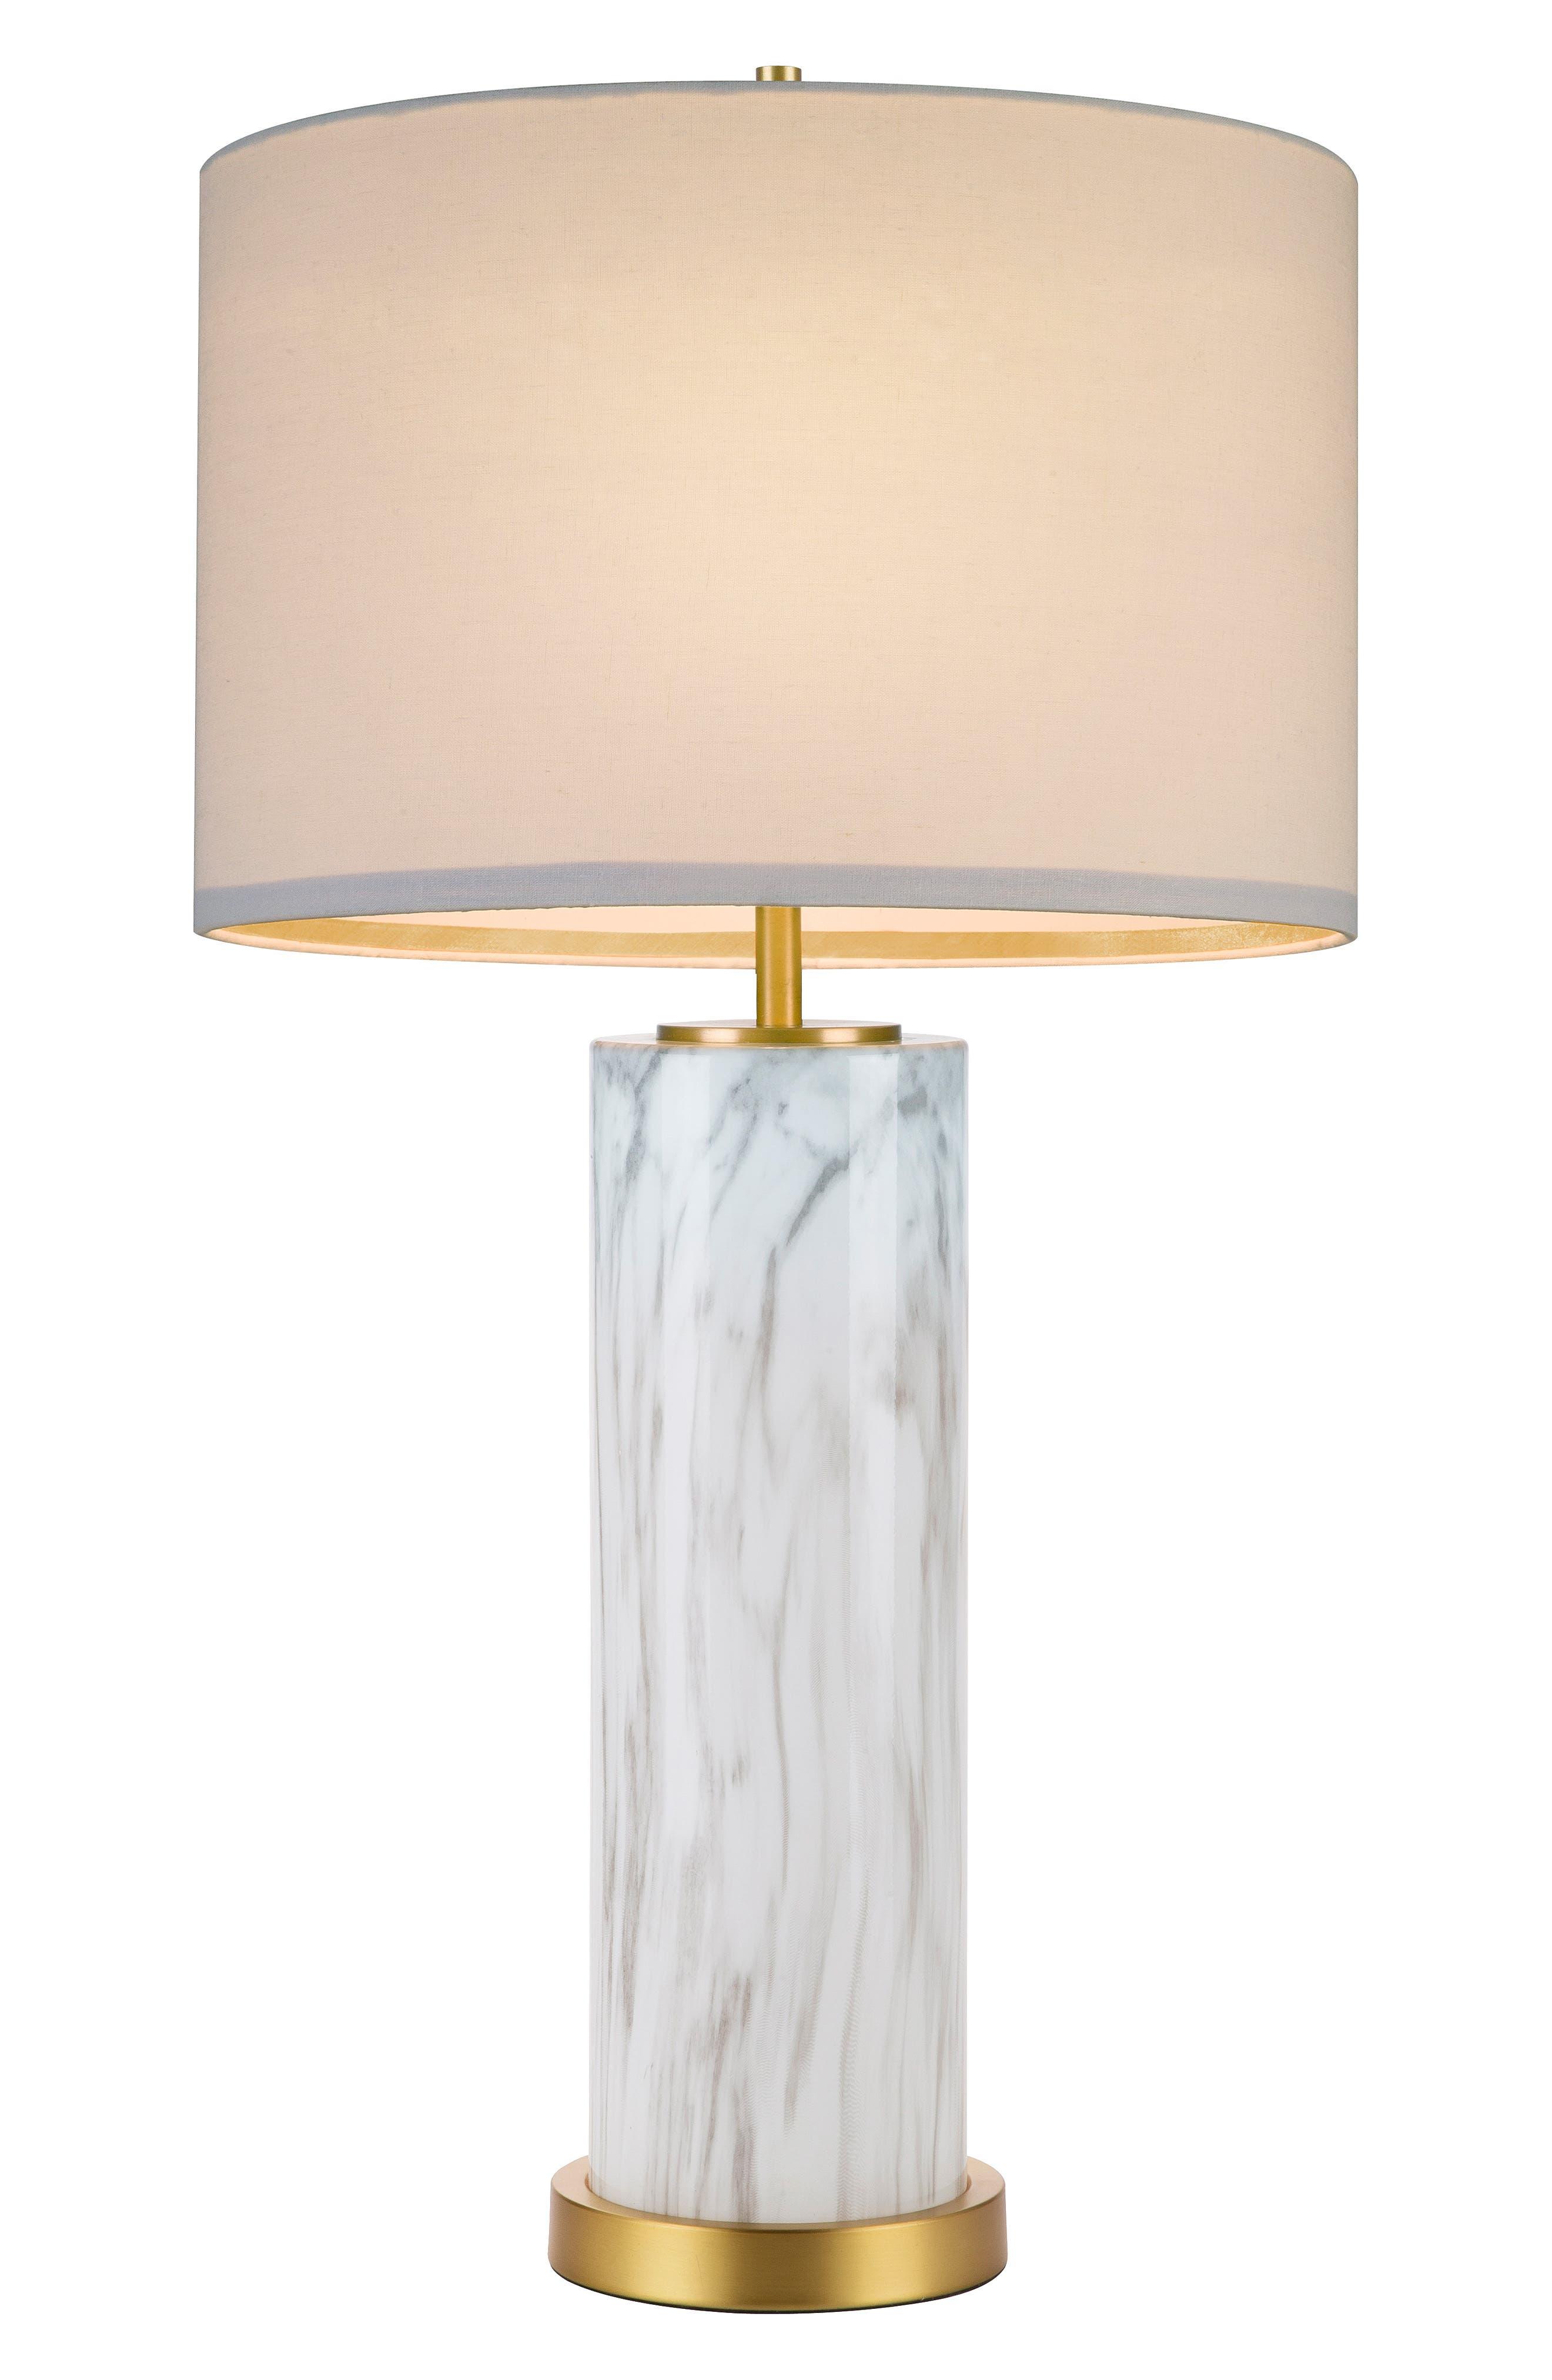 Marble Column Table Lamp,                             Main thumbnail 1, color,